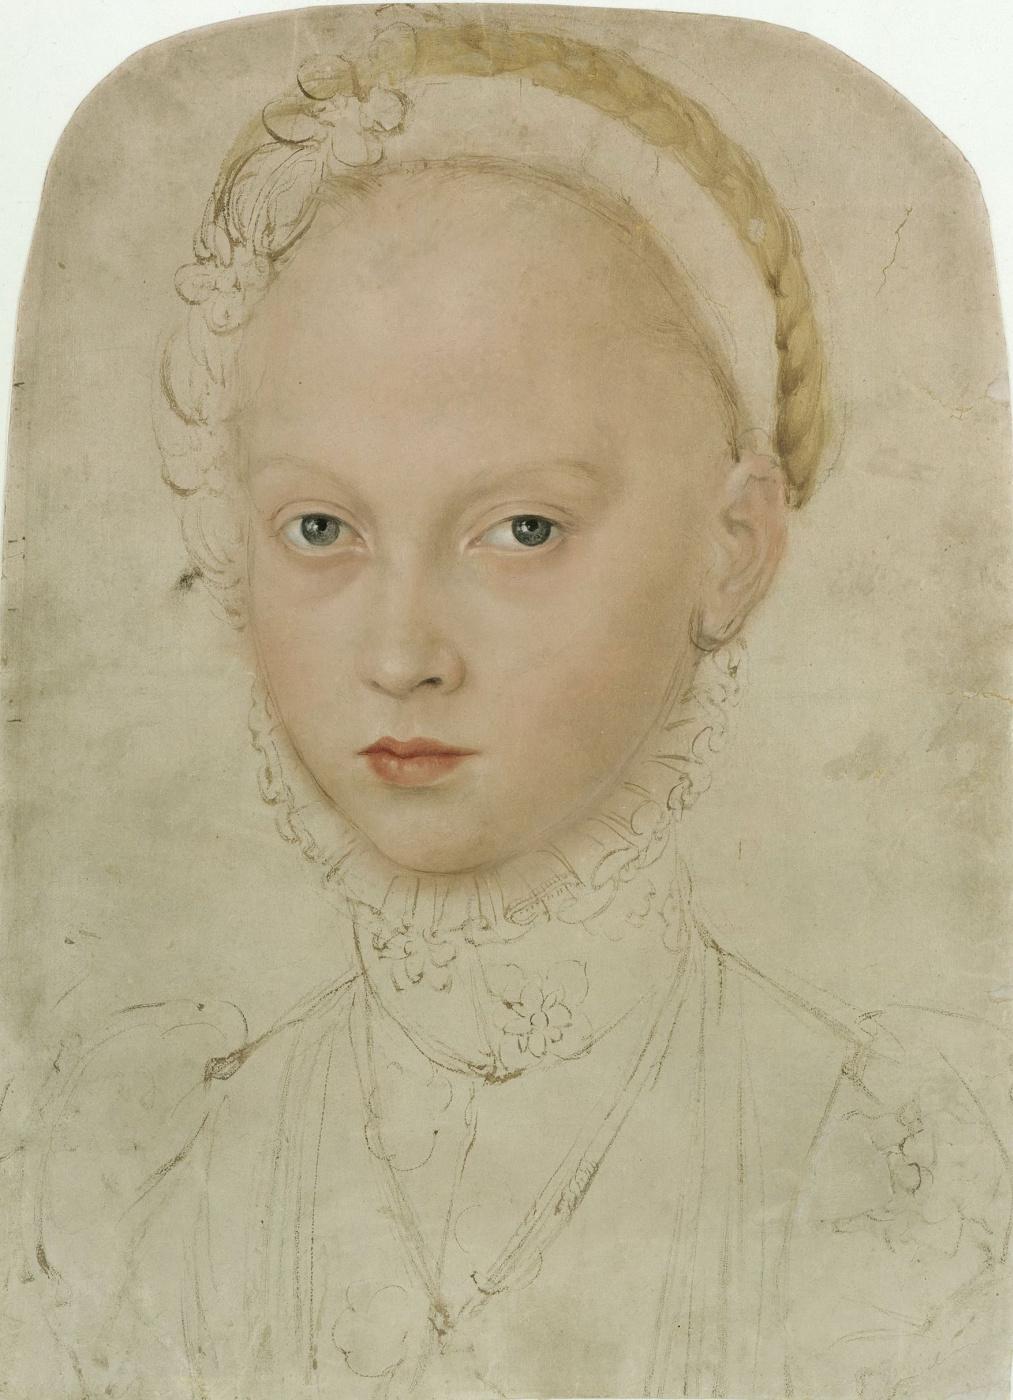 Lucas the Younger Cranach. Portrait of Princess Elizabeth of Saxony